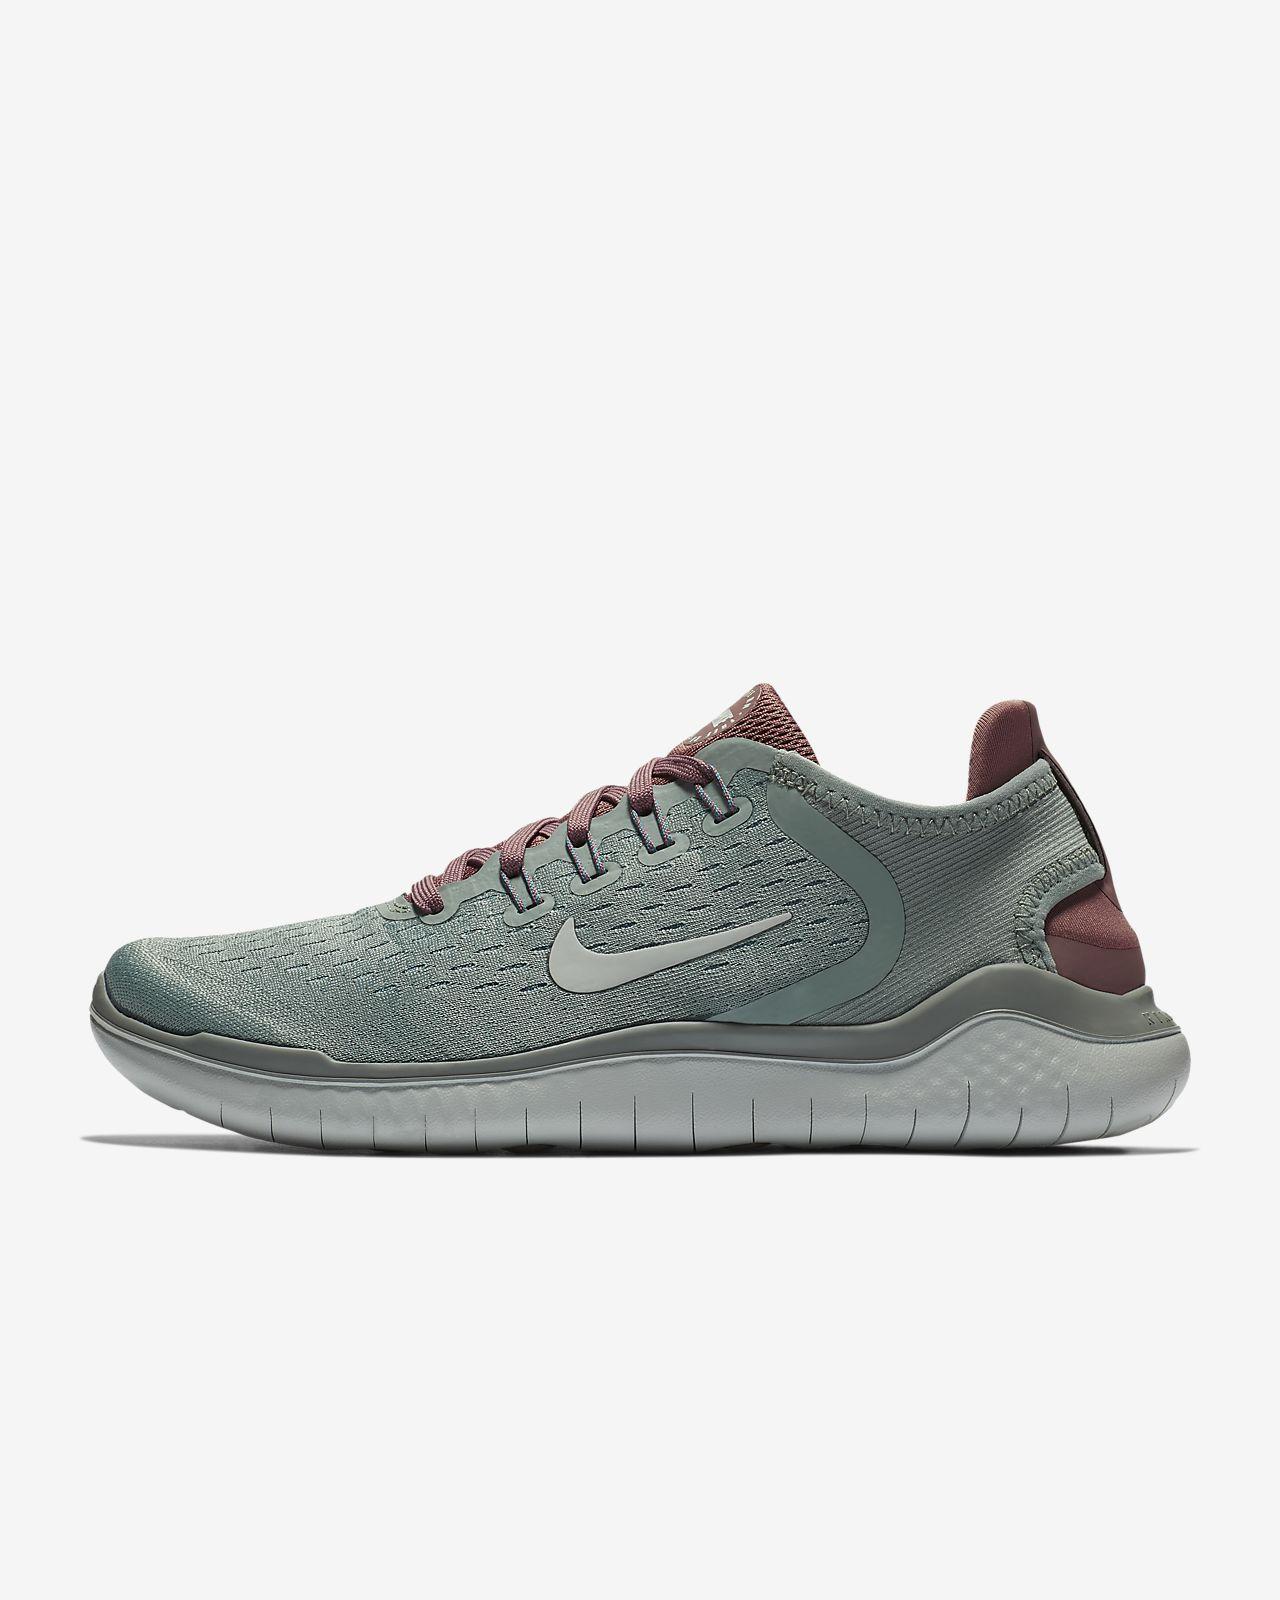 sports shoes eabf5 83cb5 ... wholesale nike free rn 2018 zapatillas de running mujer b3cff 8fb27